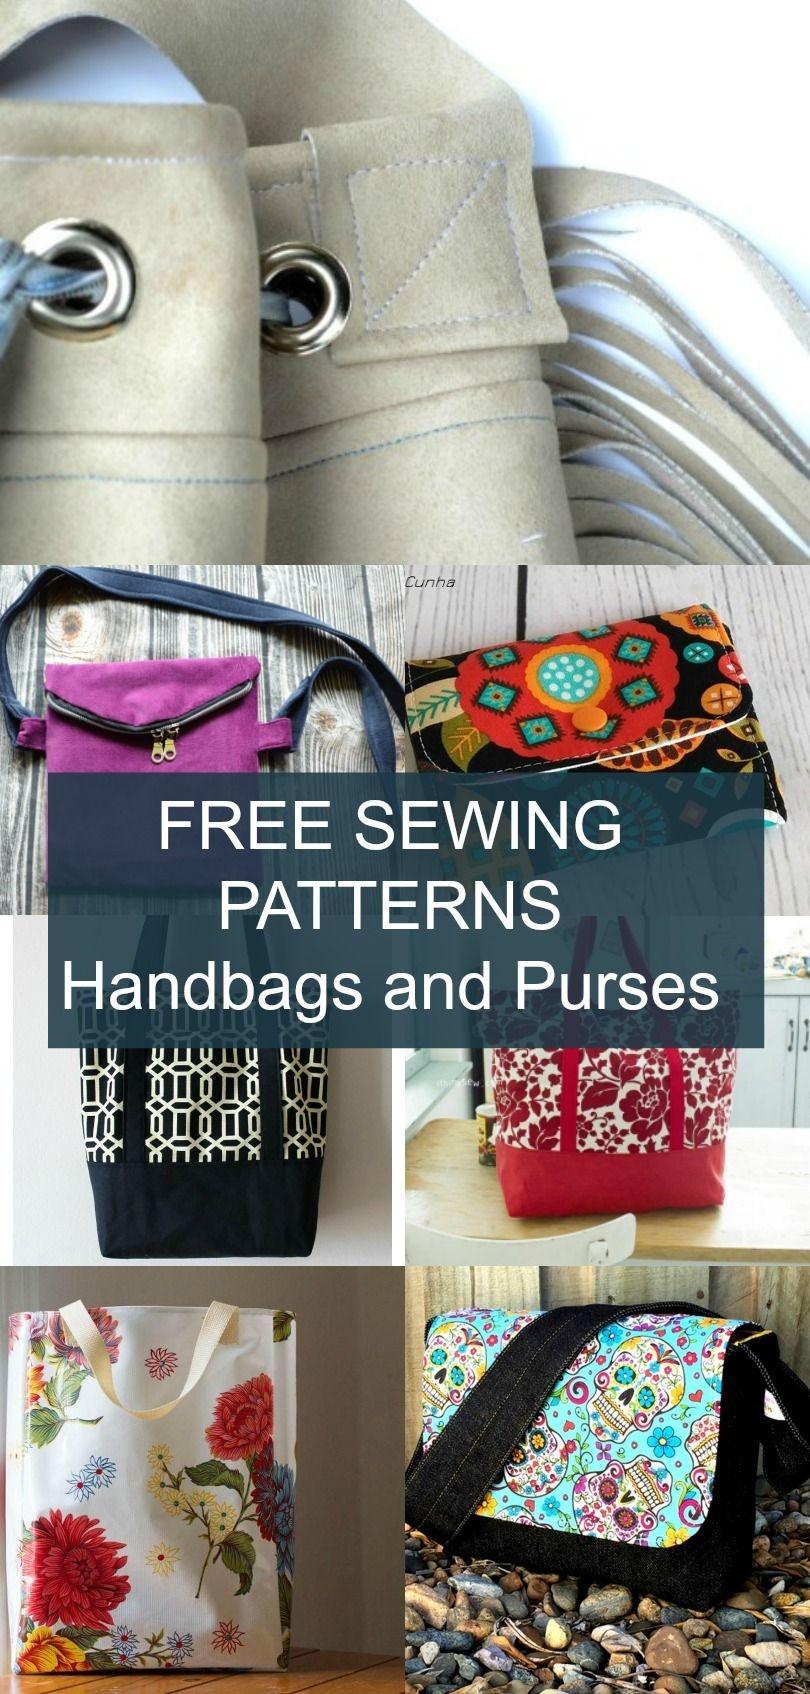 Free Pattern Alert 20 Handbags And Purses - On The Cutting Floor - Handbag Patterns Free Printable